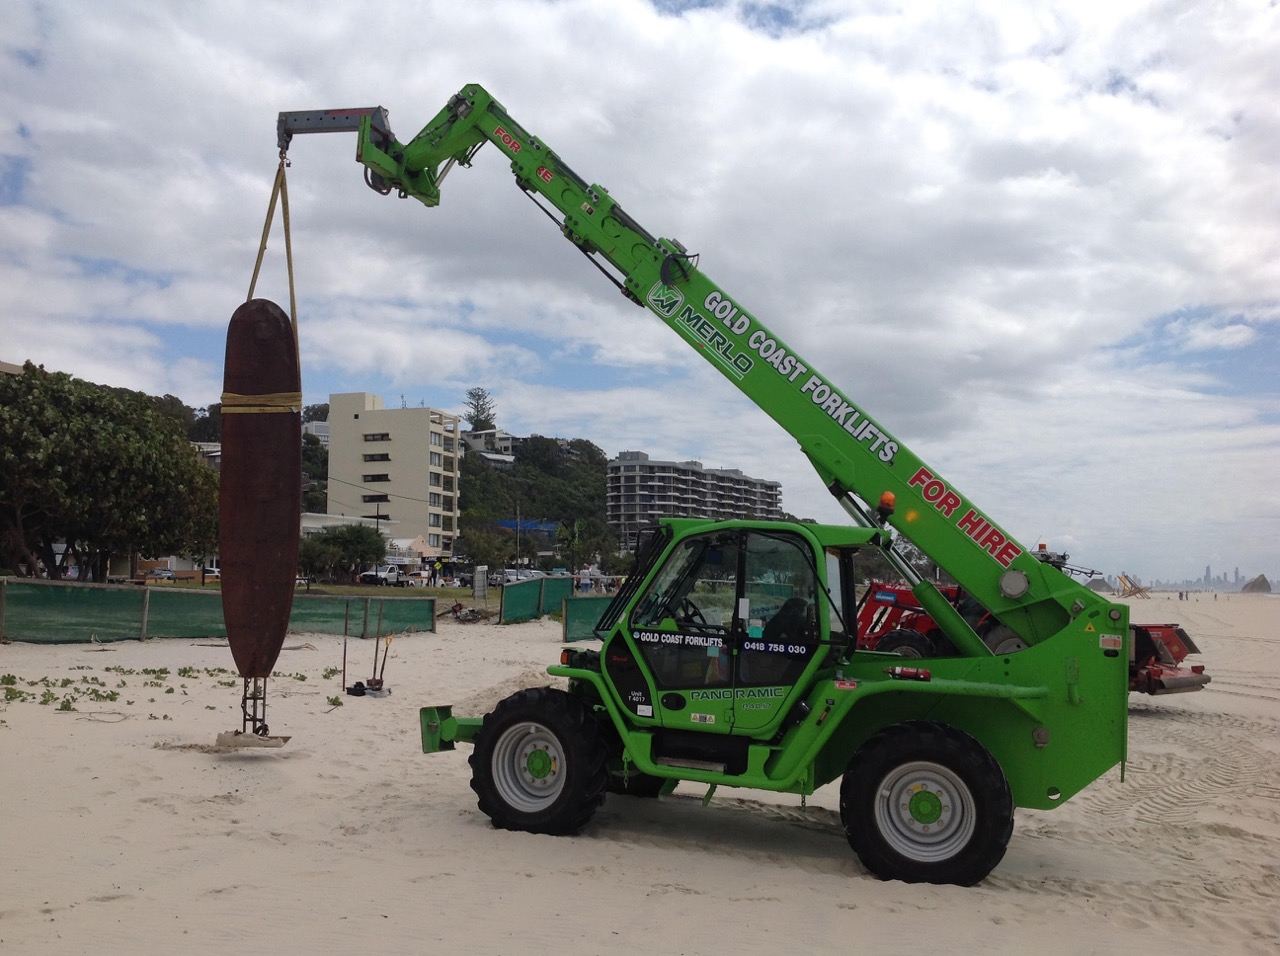 The Swell Festival Beach Work Operator Service 3